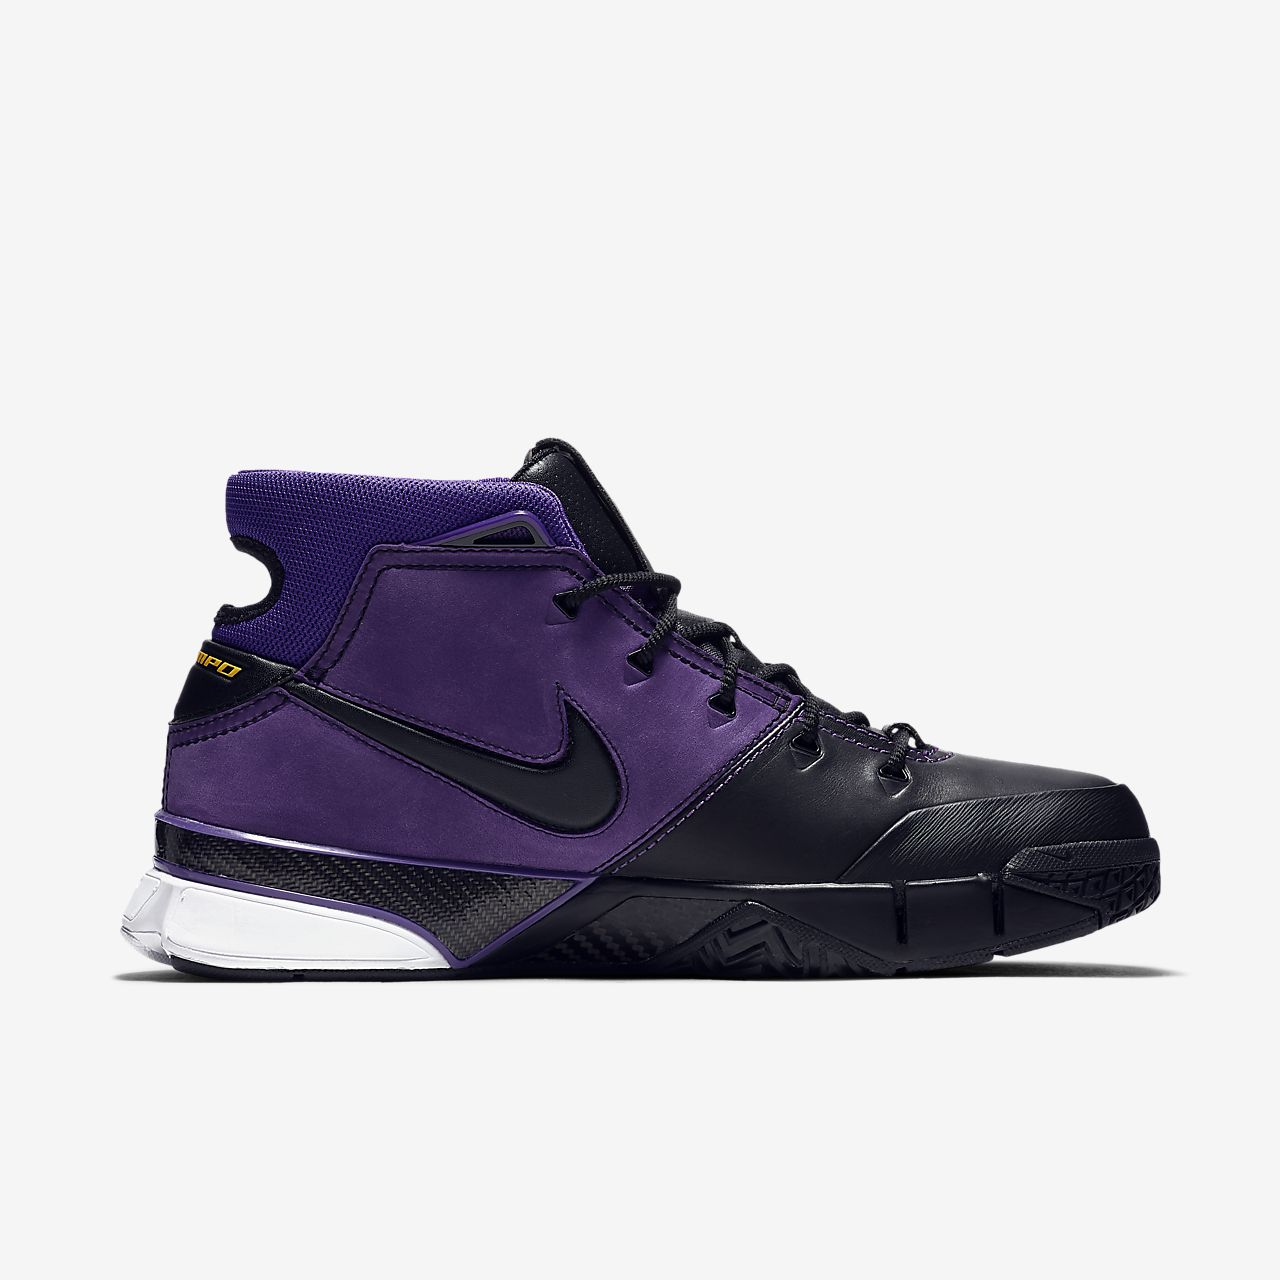 25caad5bcf1 Calzado de básquetbol Kobe 1 Protro. Nike.com CL